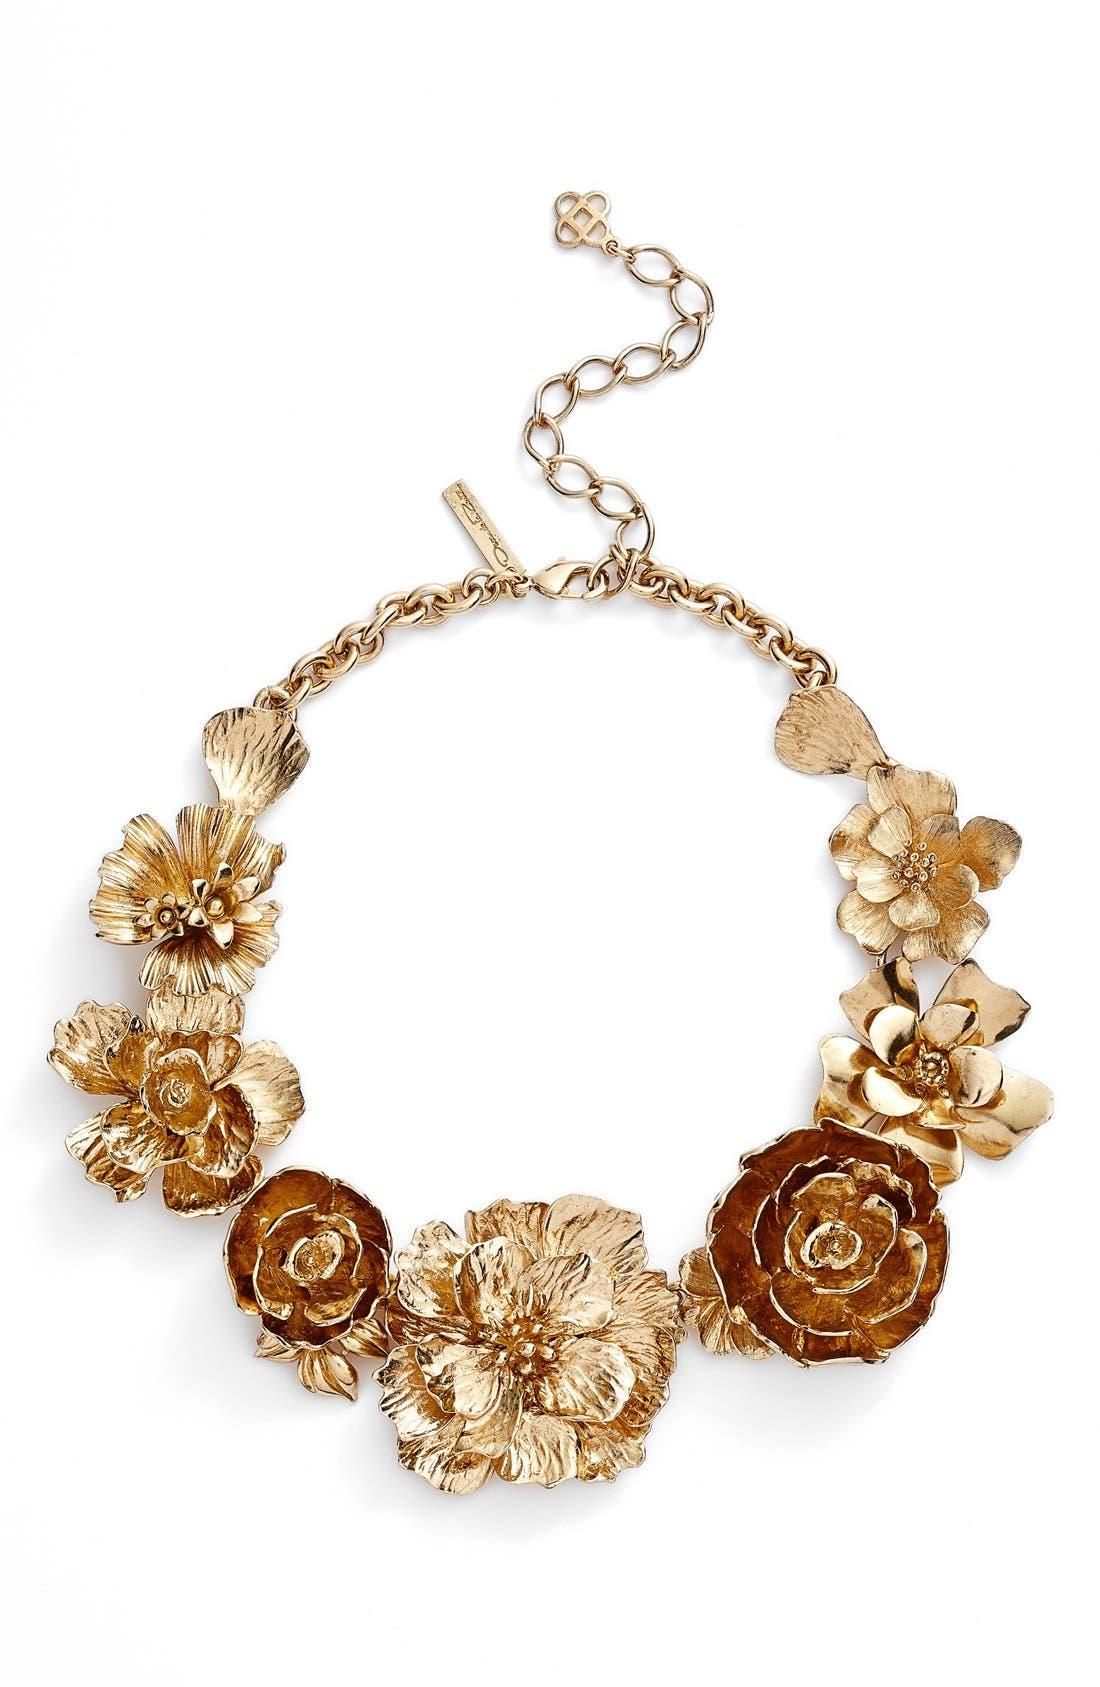 Alternate Image 1 Selected - Oscar de la Renta 'Bold Flower' Necklace